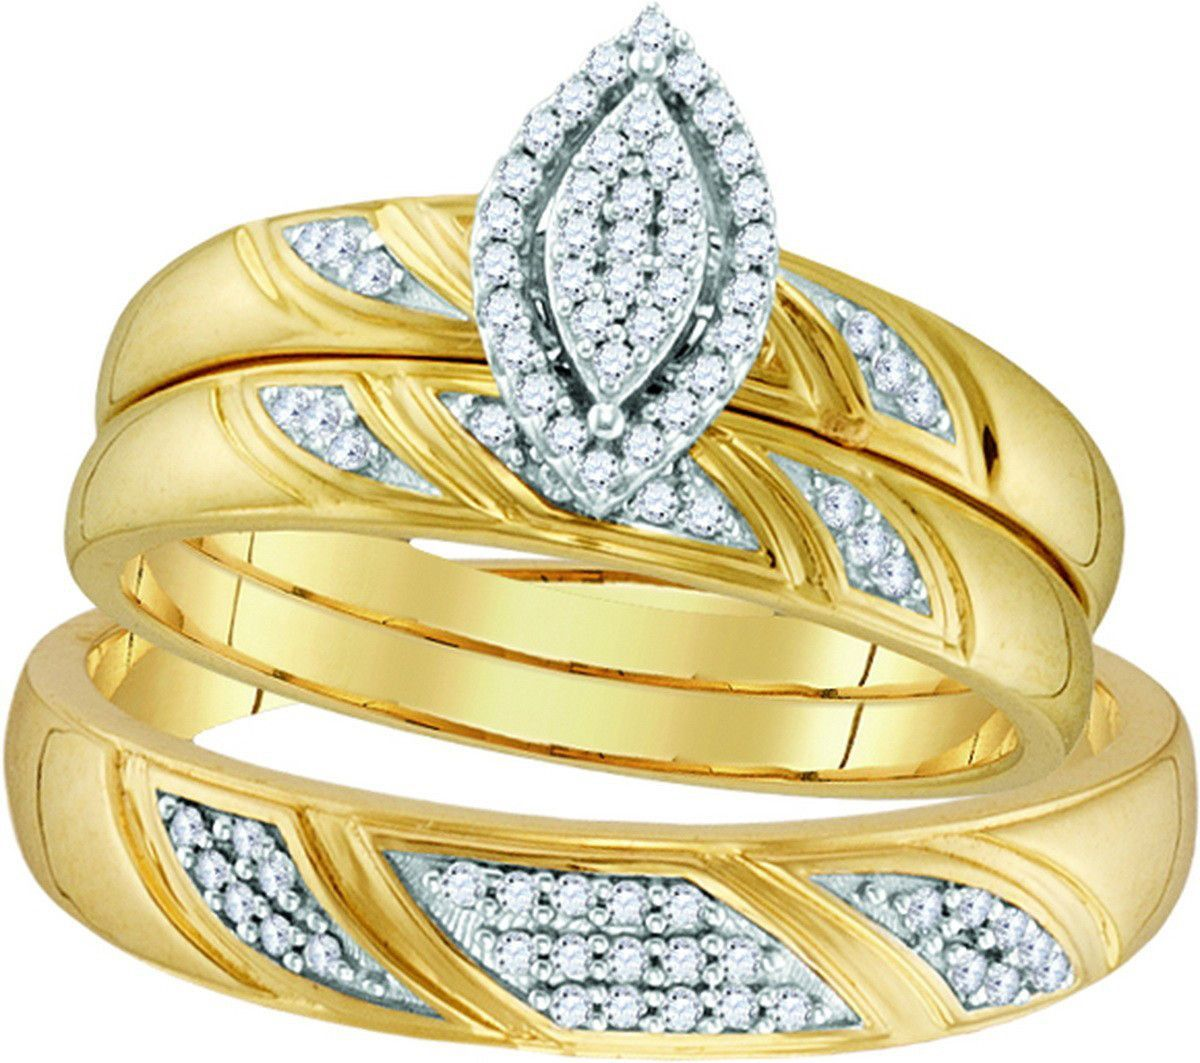 10k Yellow Gold Natural Diamond His & Hers Matching Trio